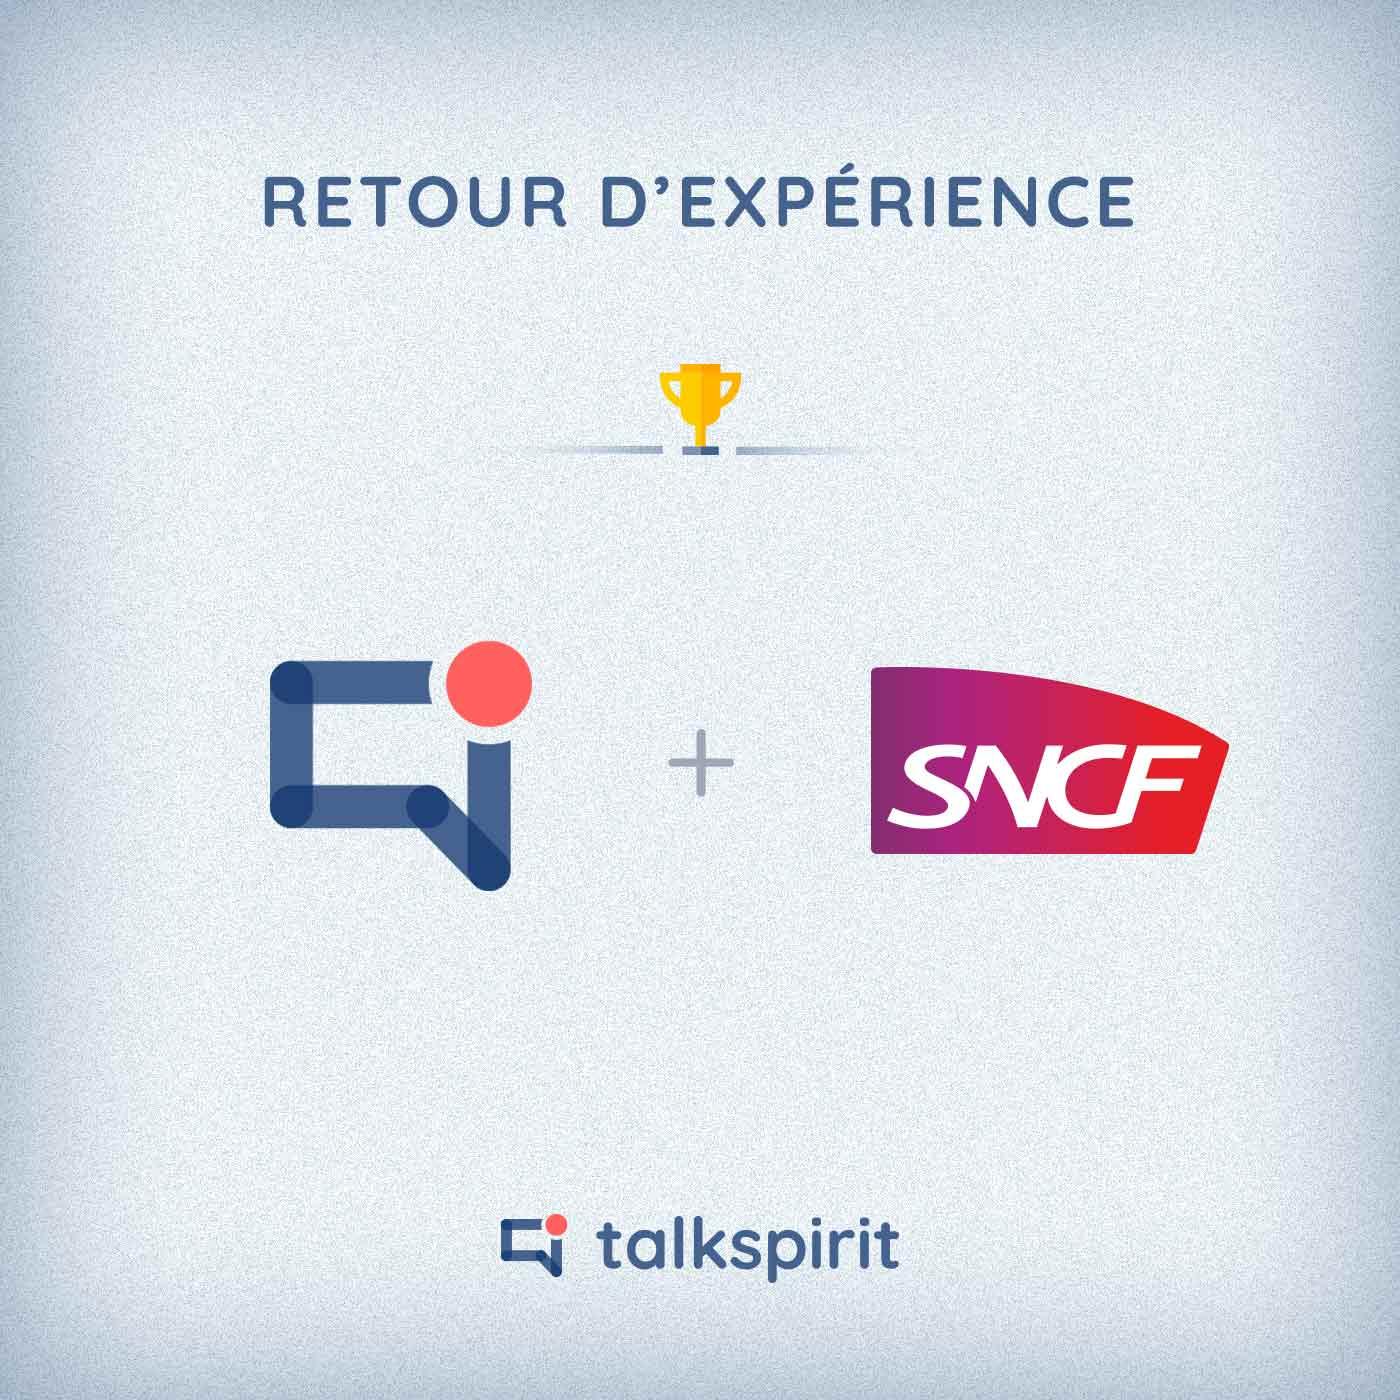 retour experience talkspirit sncf